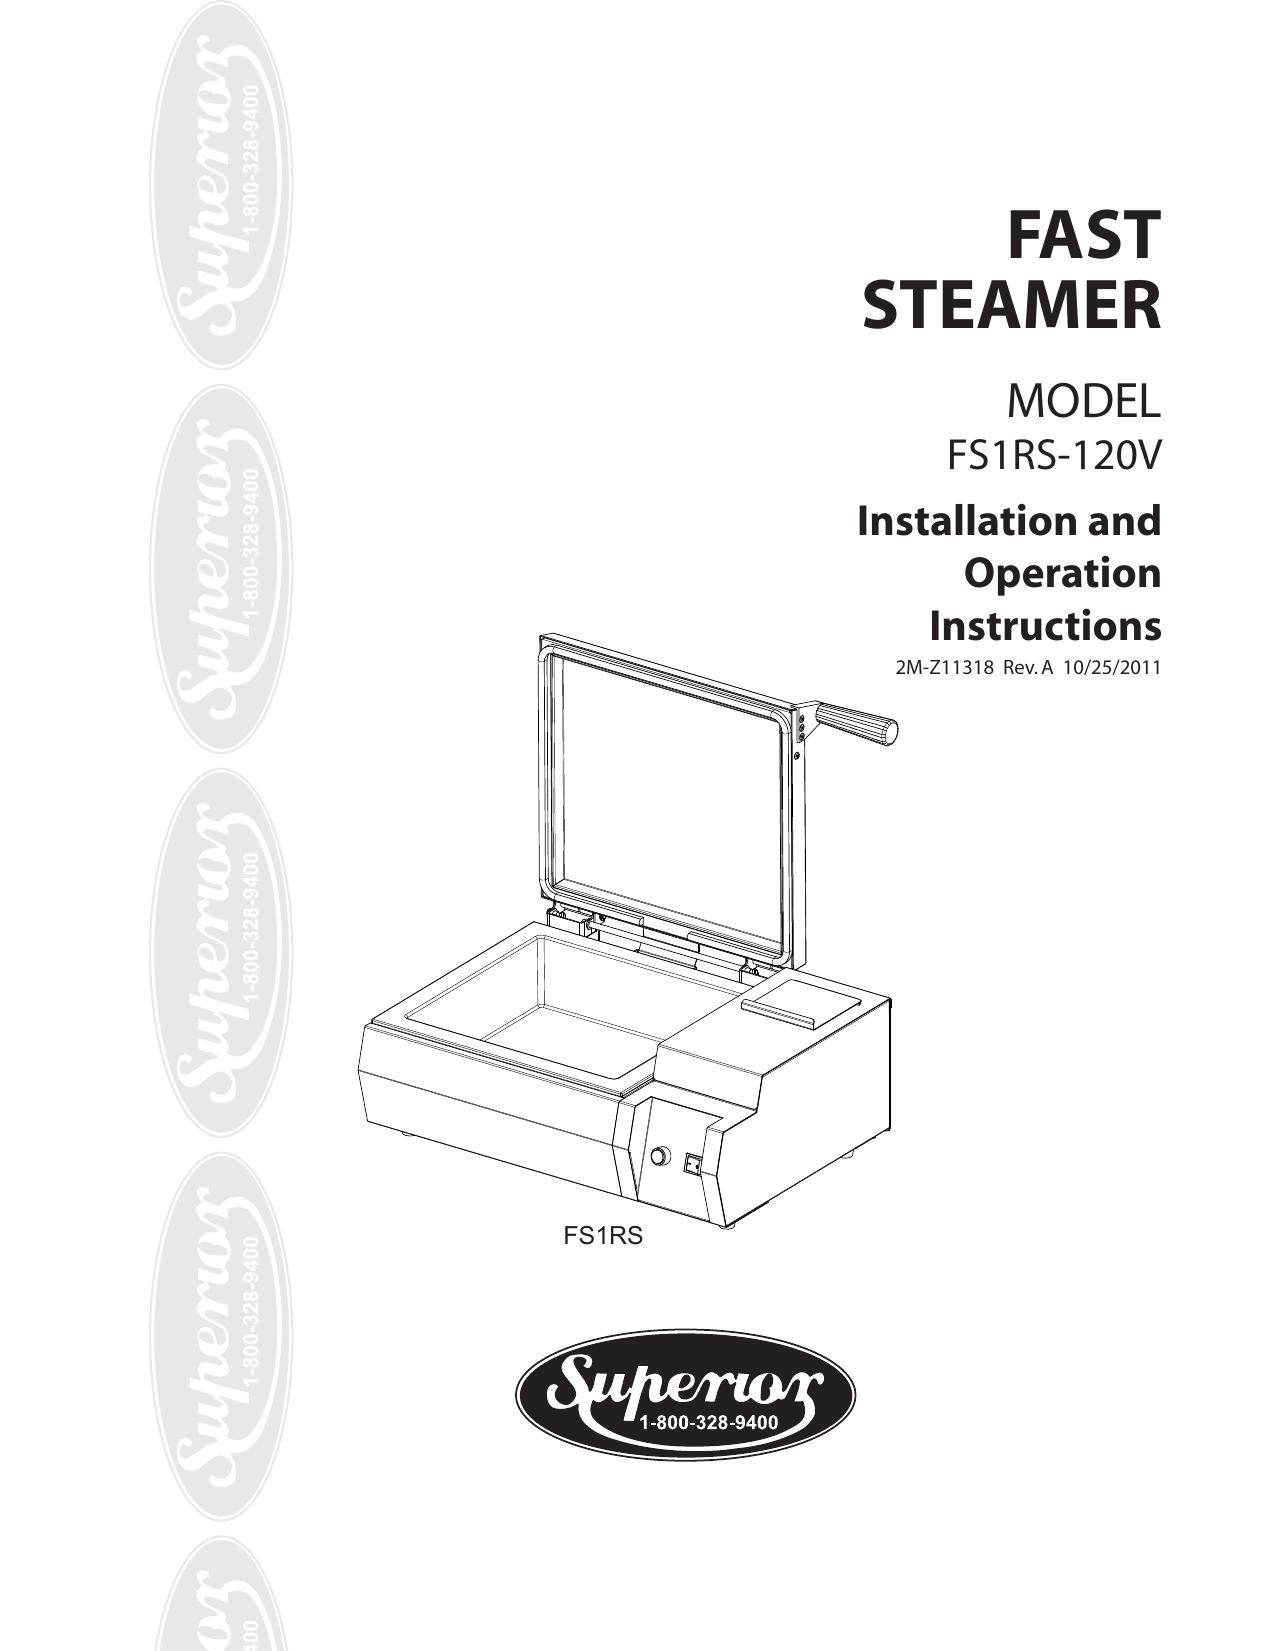 FAST STEAMER MODEL FS1RS-120V | manualzz.com on